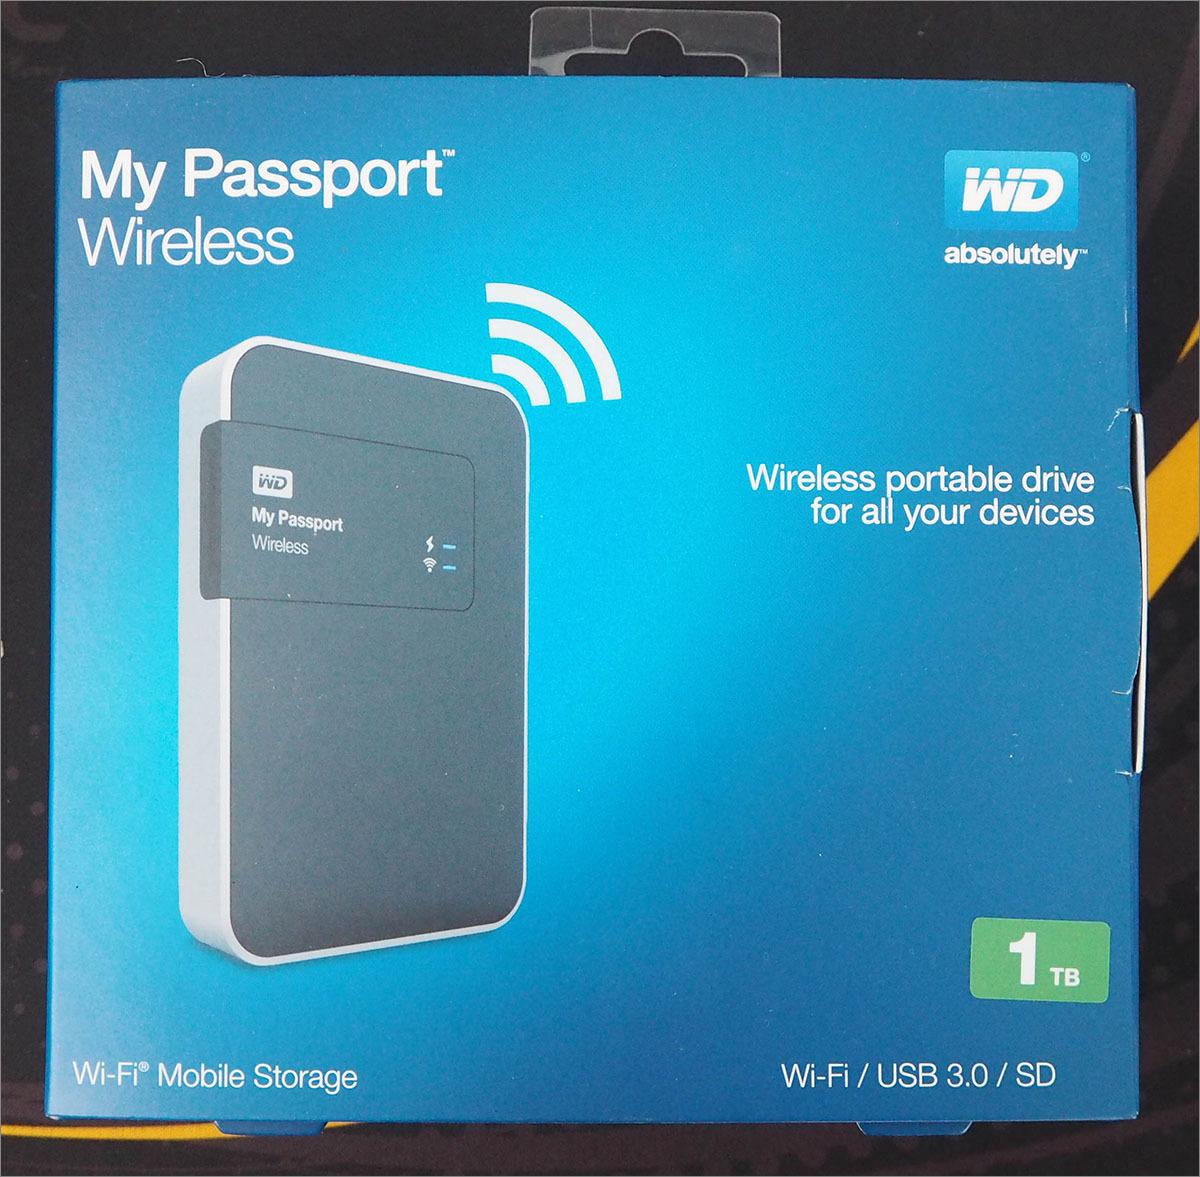 Тестирование беспроводного жесткого диска Western Digital My Passport Wireless 1 Tb - 1